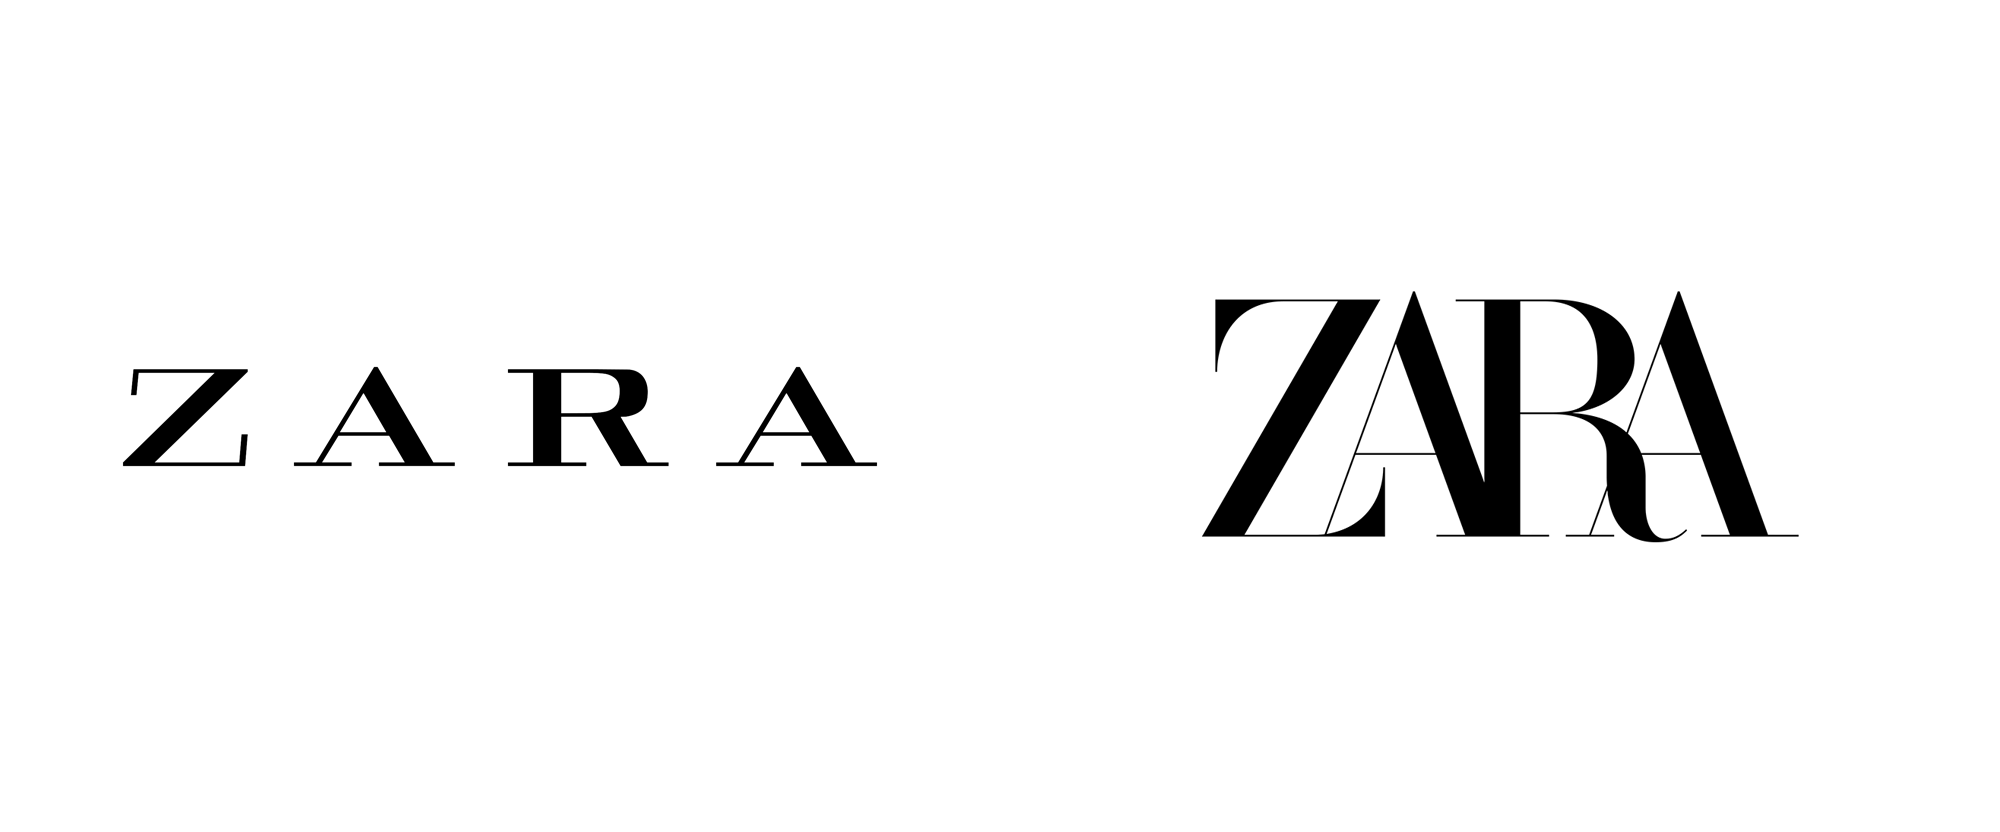 Zara brand logo changed